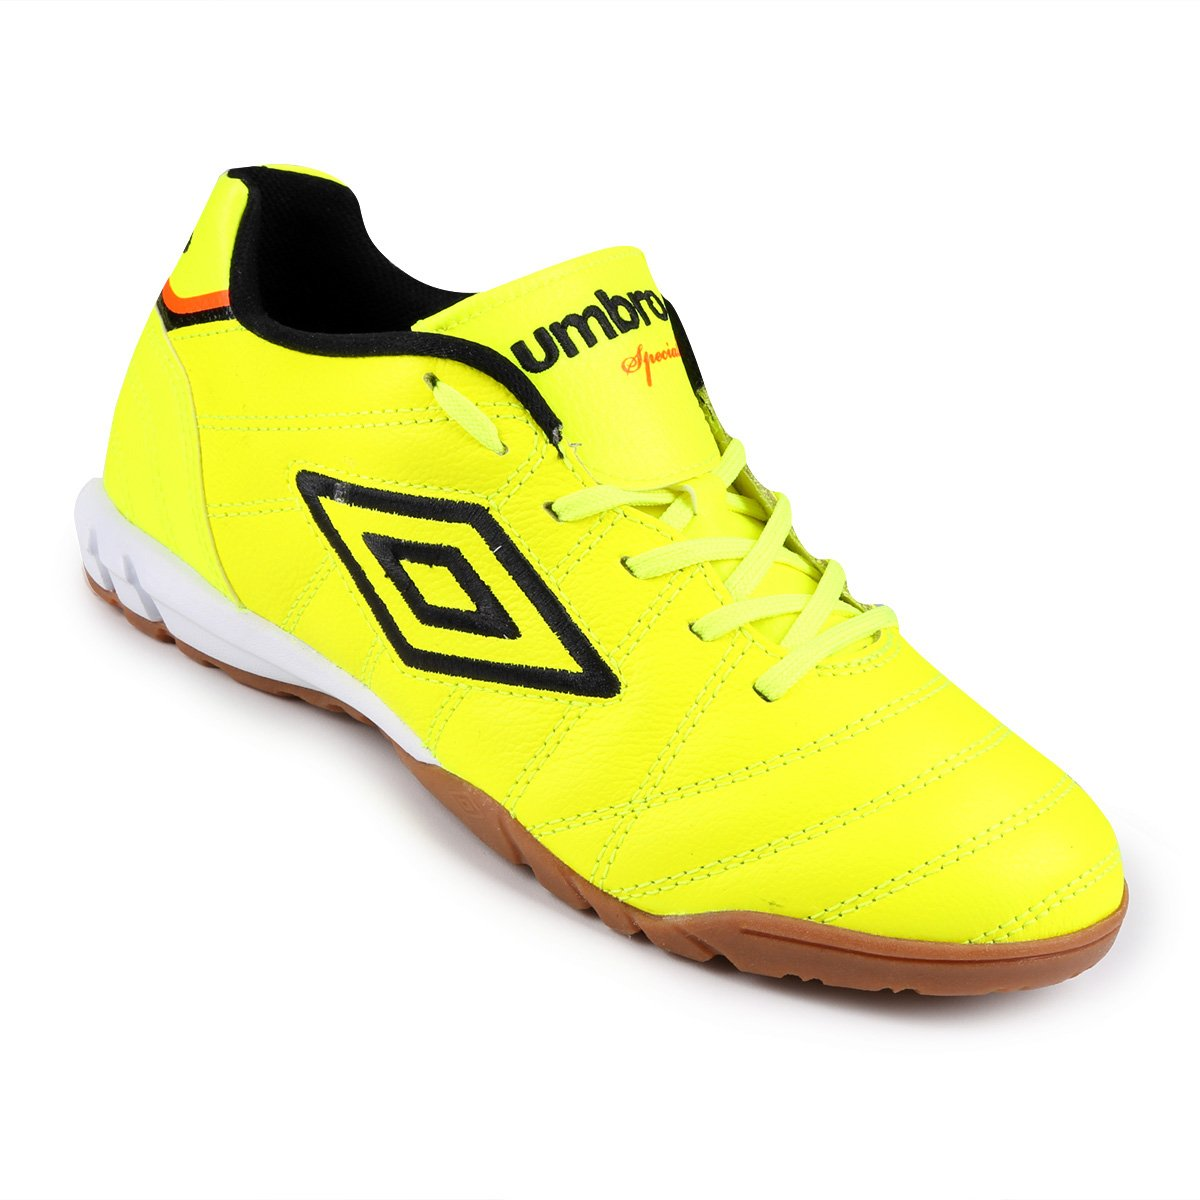 Chuteira Futsal Umbro Speciali Premier Masculina - Compre Agora ... d91e2ea91cf03